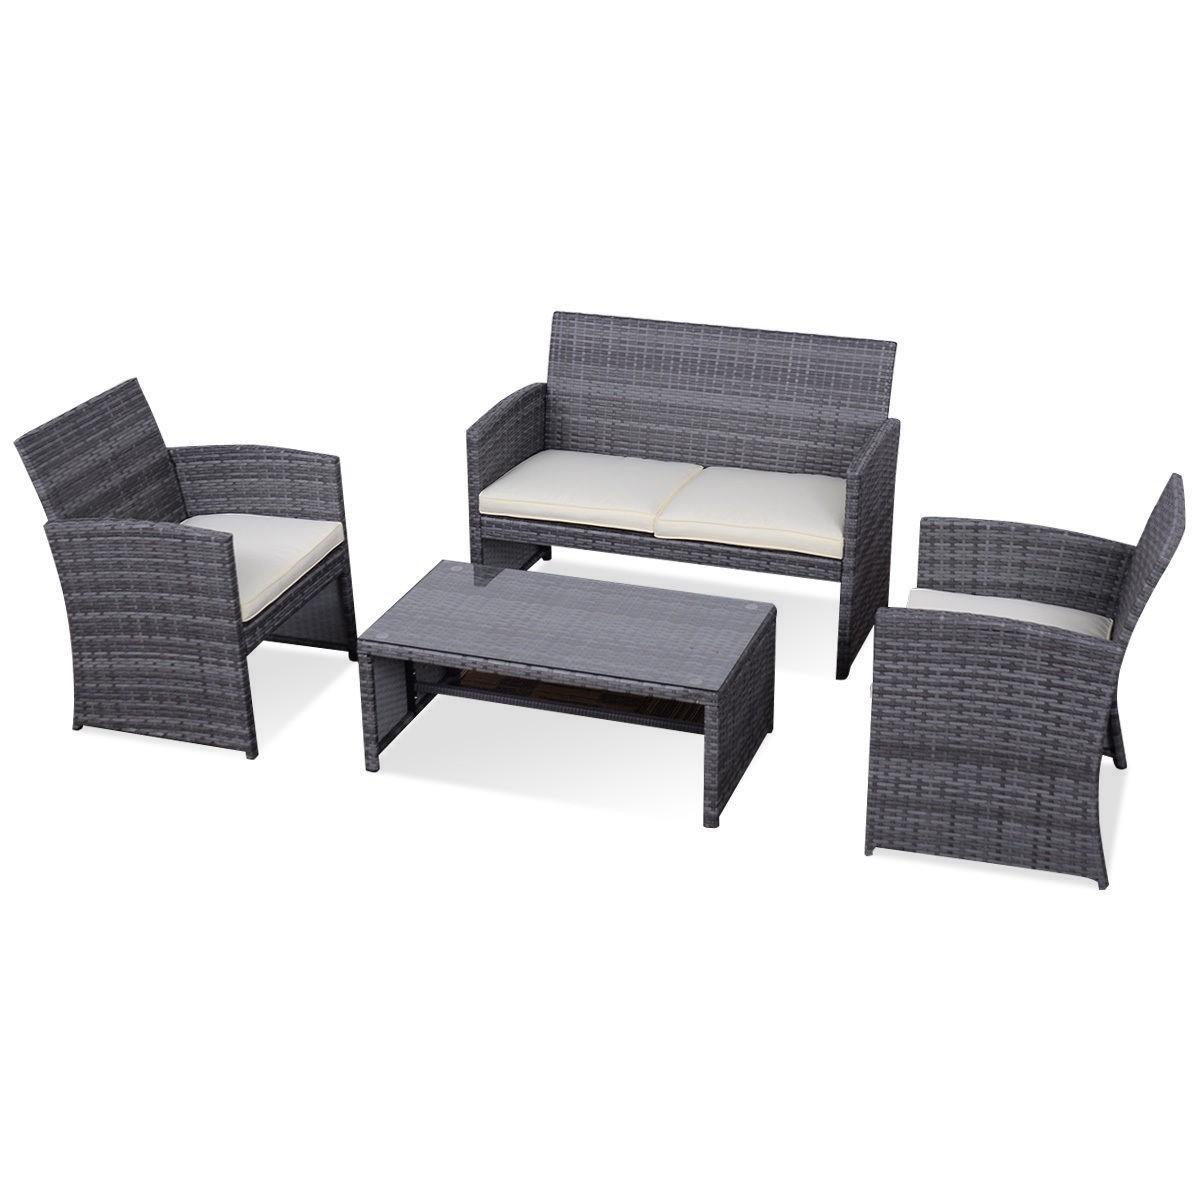 4 pcs Outdoor Rattan Sofa Furniture Set Black by